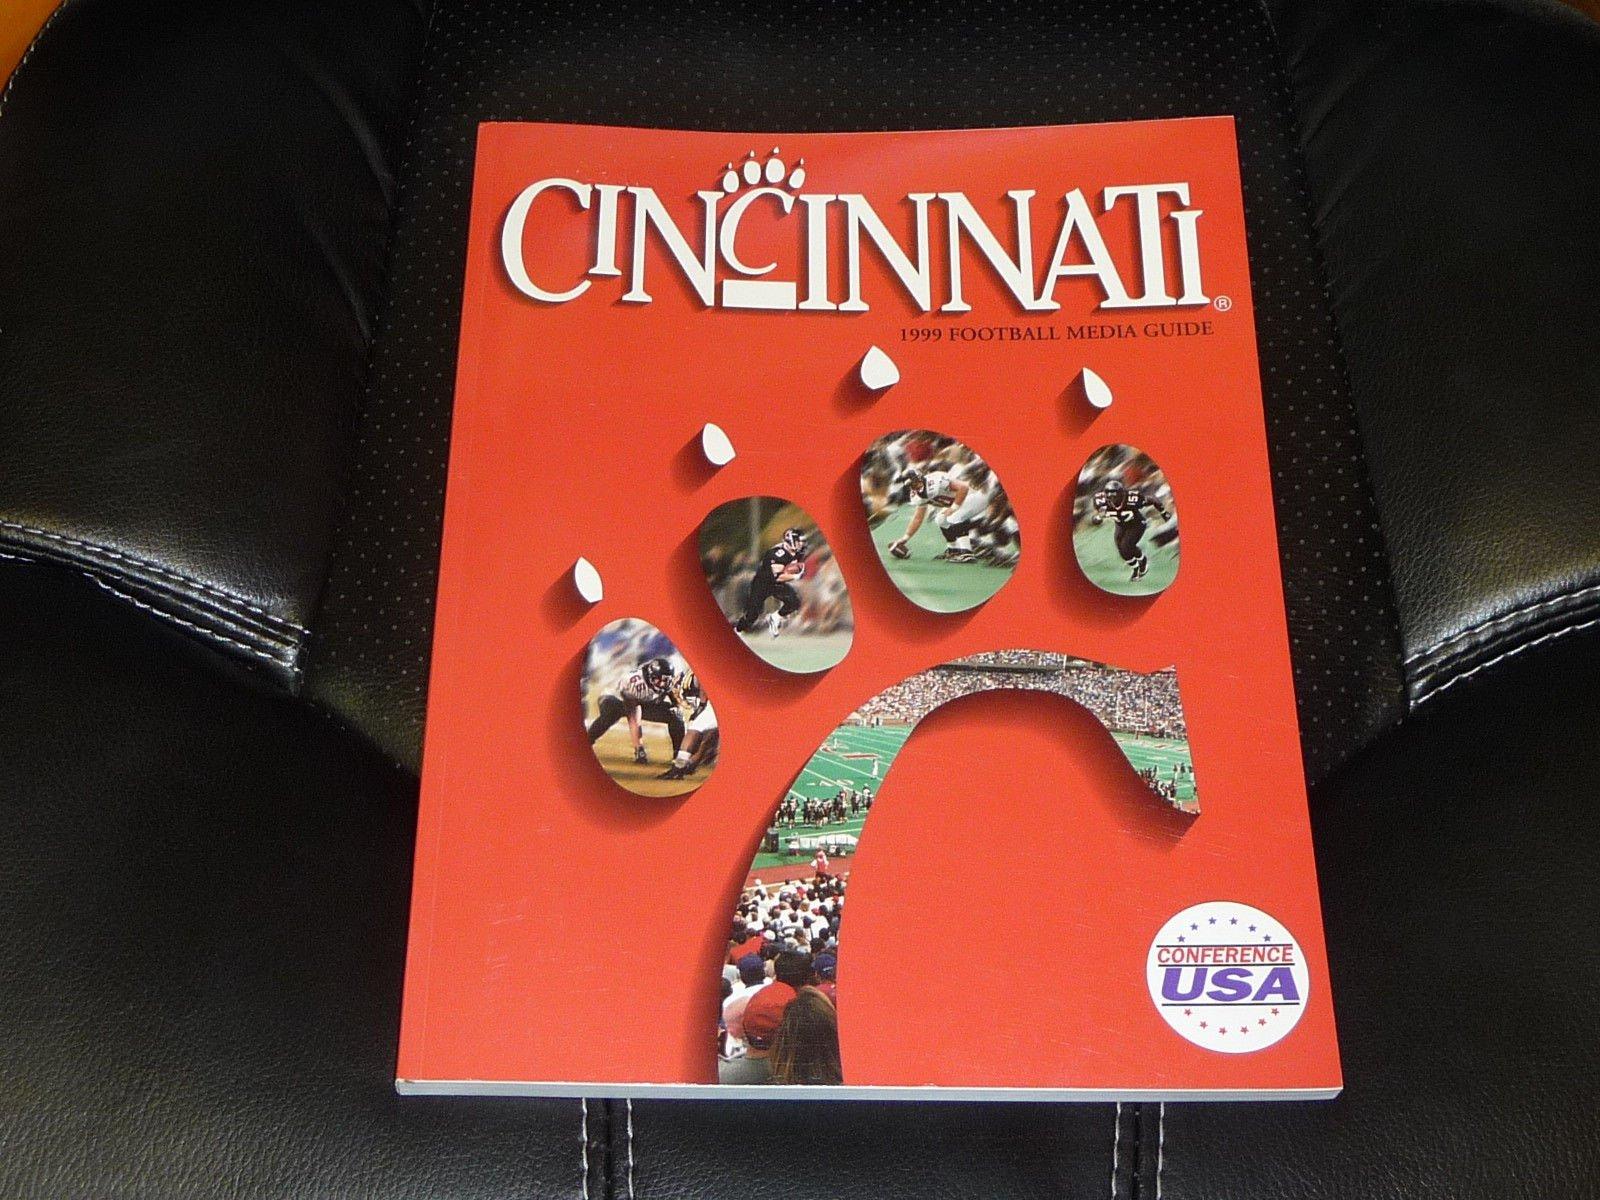 1999 CINCINNATI COLLEGE FOOTBALL MEDIA GUIDE COVER EX MINT BOX 13